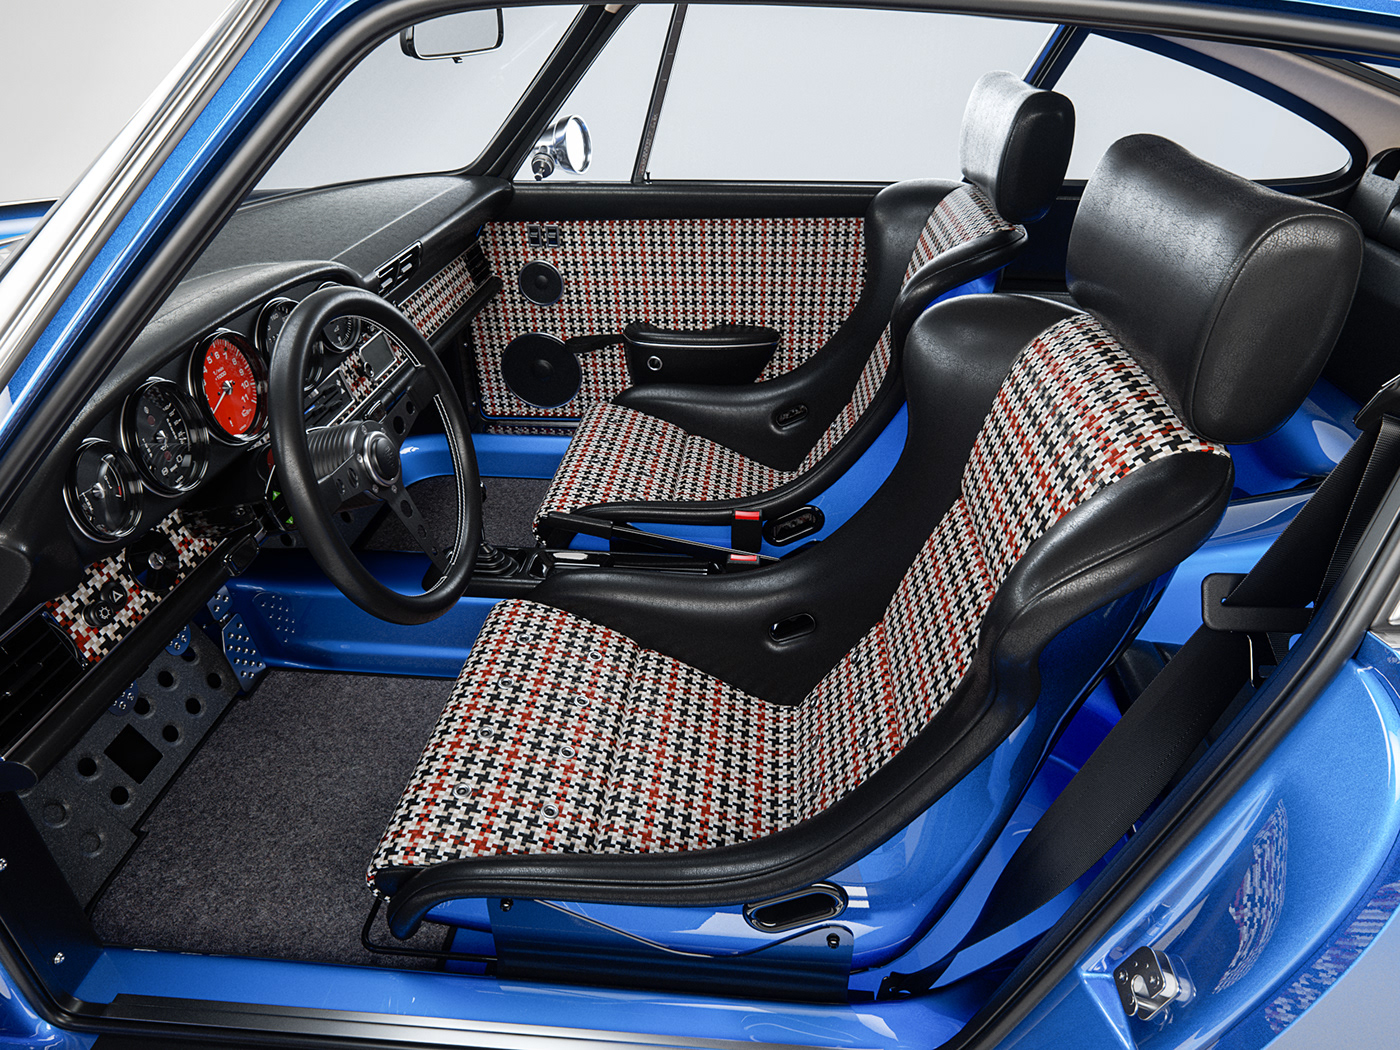 Porsche car modeling automotive   Singer 3D blender corona